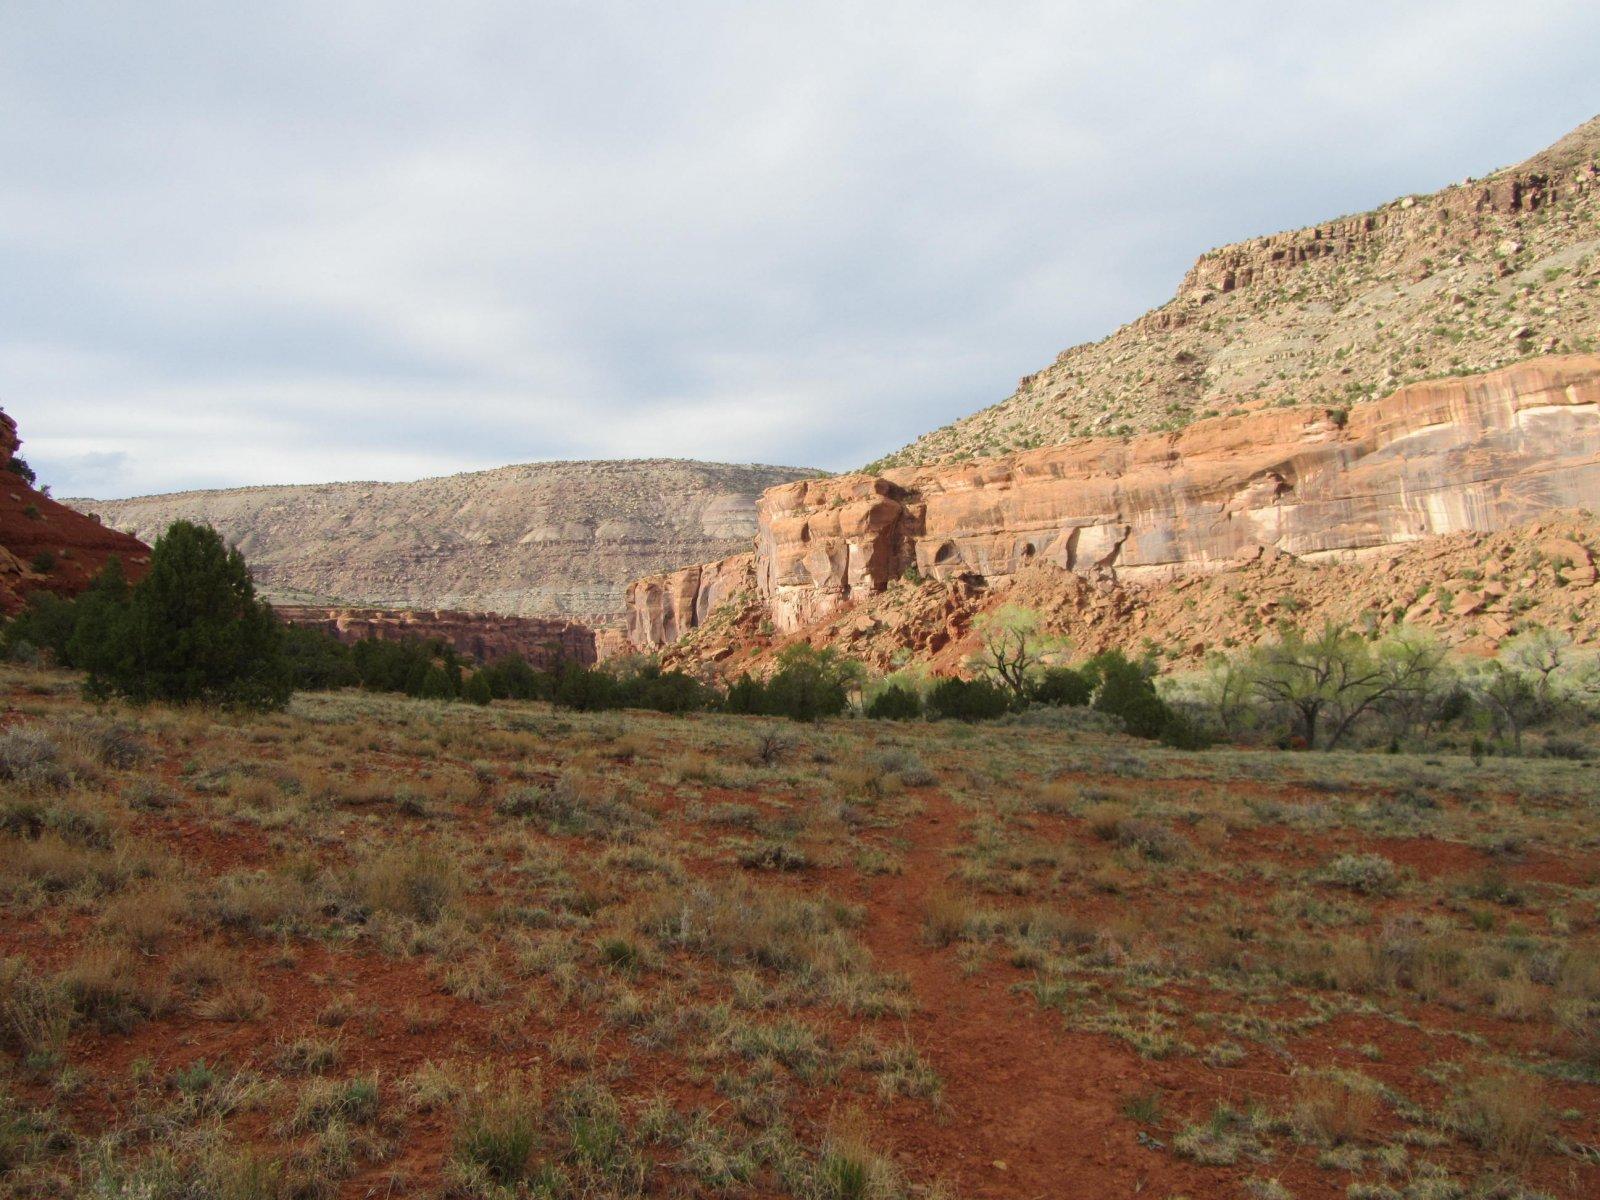 Dominguez Canyons Backpack 4.22.18 156.jpg